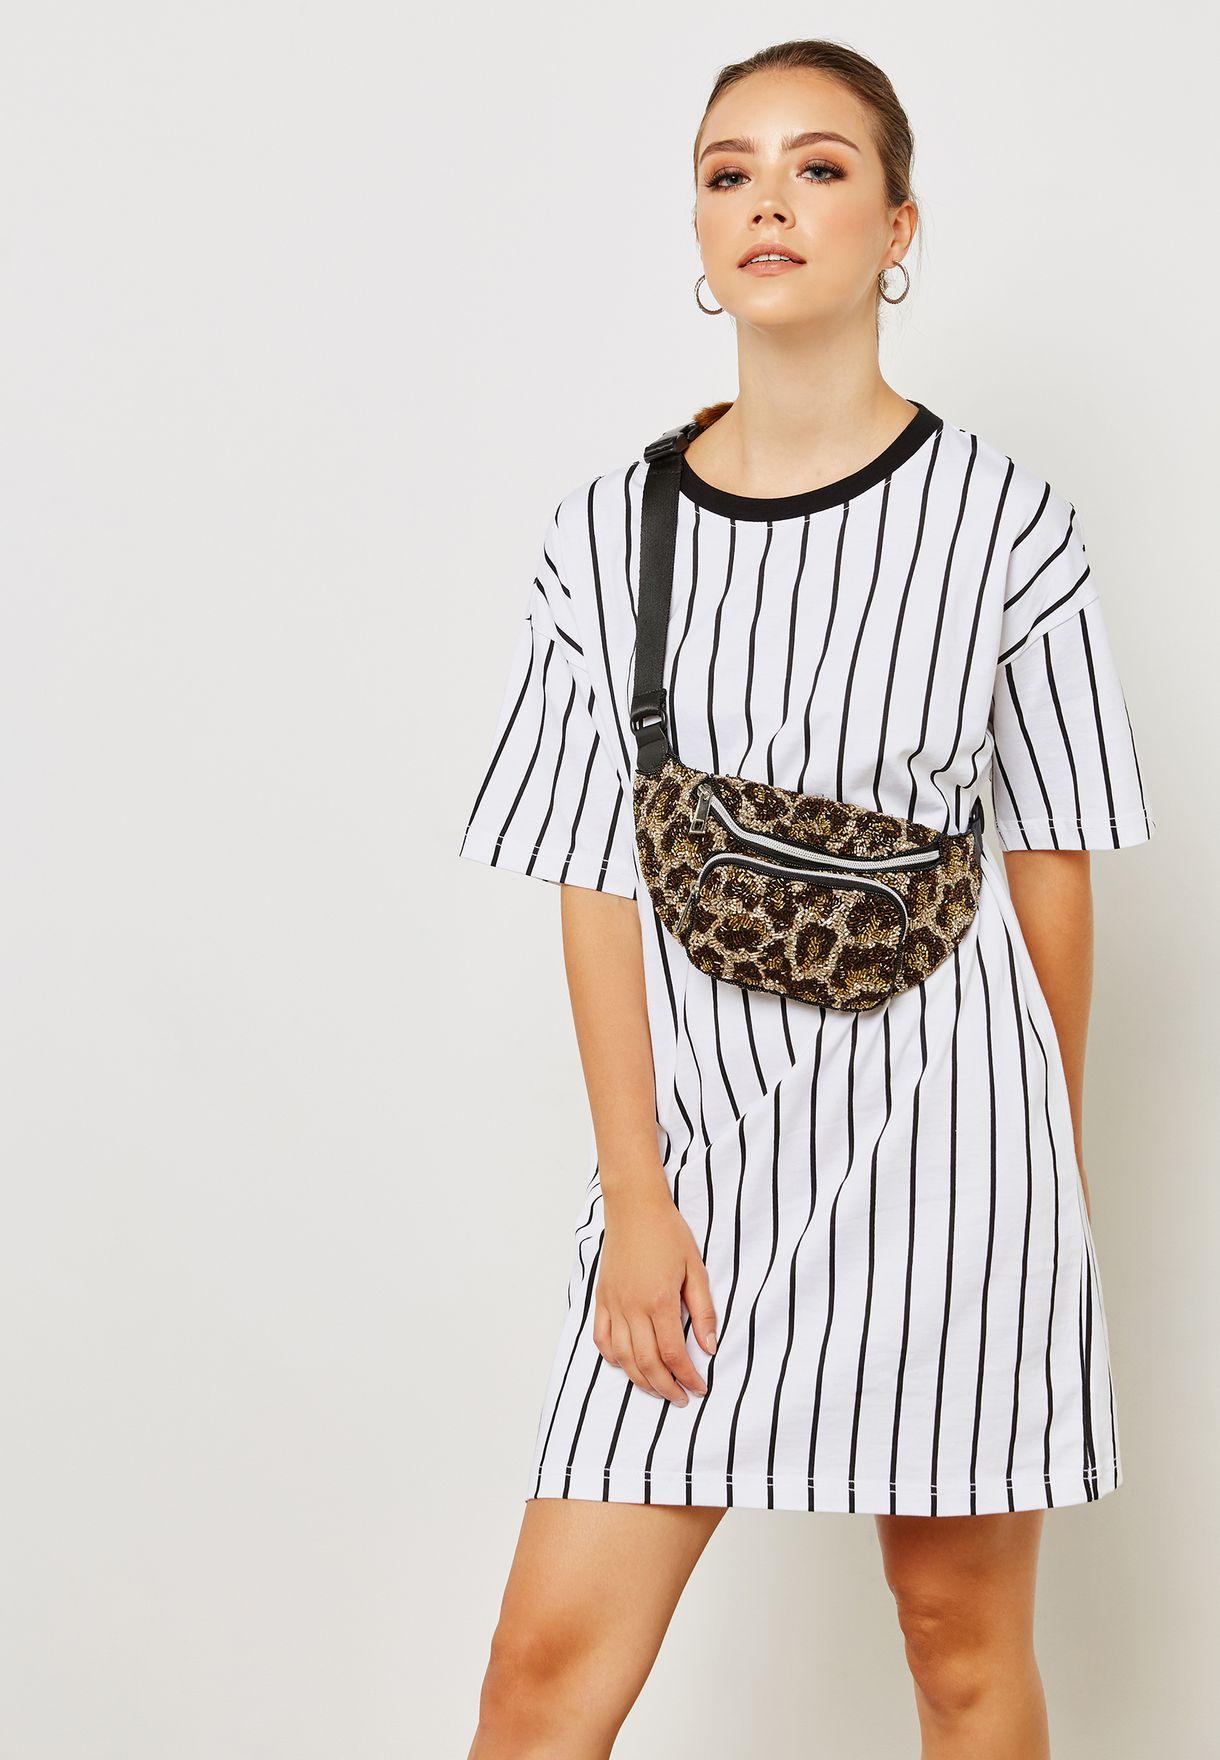 6c53241e513 Shop Forever 21 monochrome Striped T-Shirt Dress 289238 for Women in ...